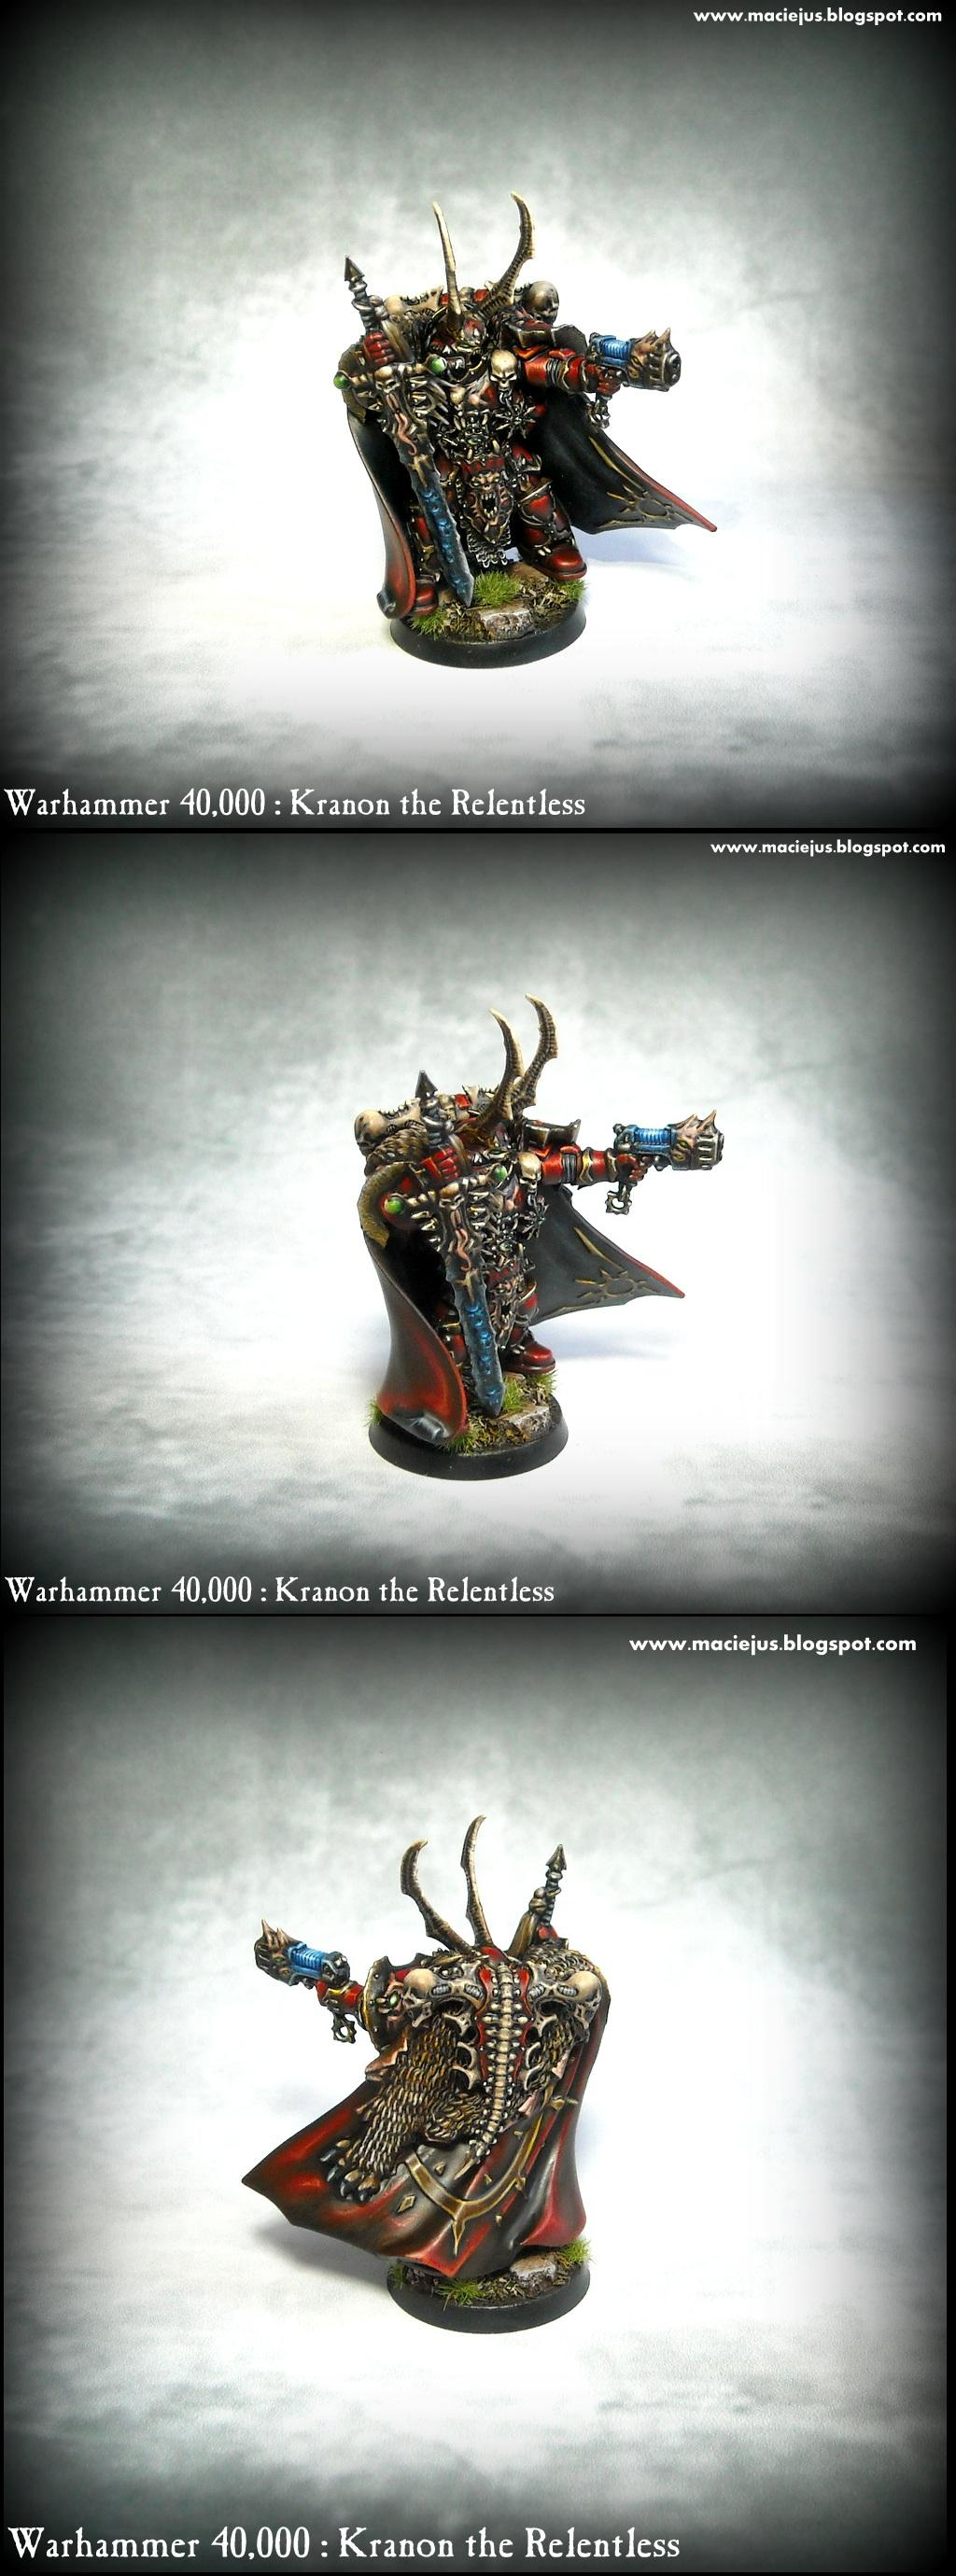 Chaos, Chaos Lord, Chaos Space Marines, Crimson Slaughter, Dark Vengeance, Khorne, Kranon The Relentless, Warhammer 40,000